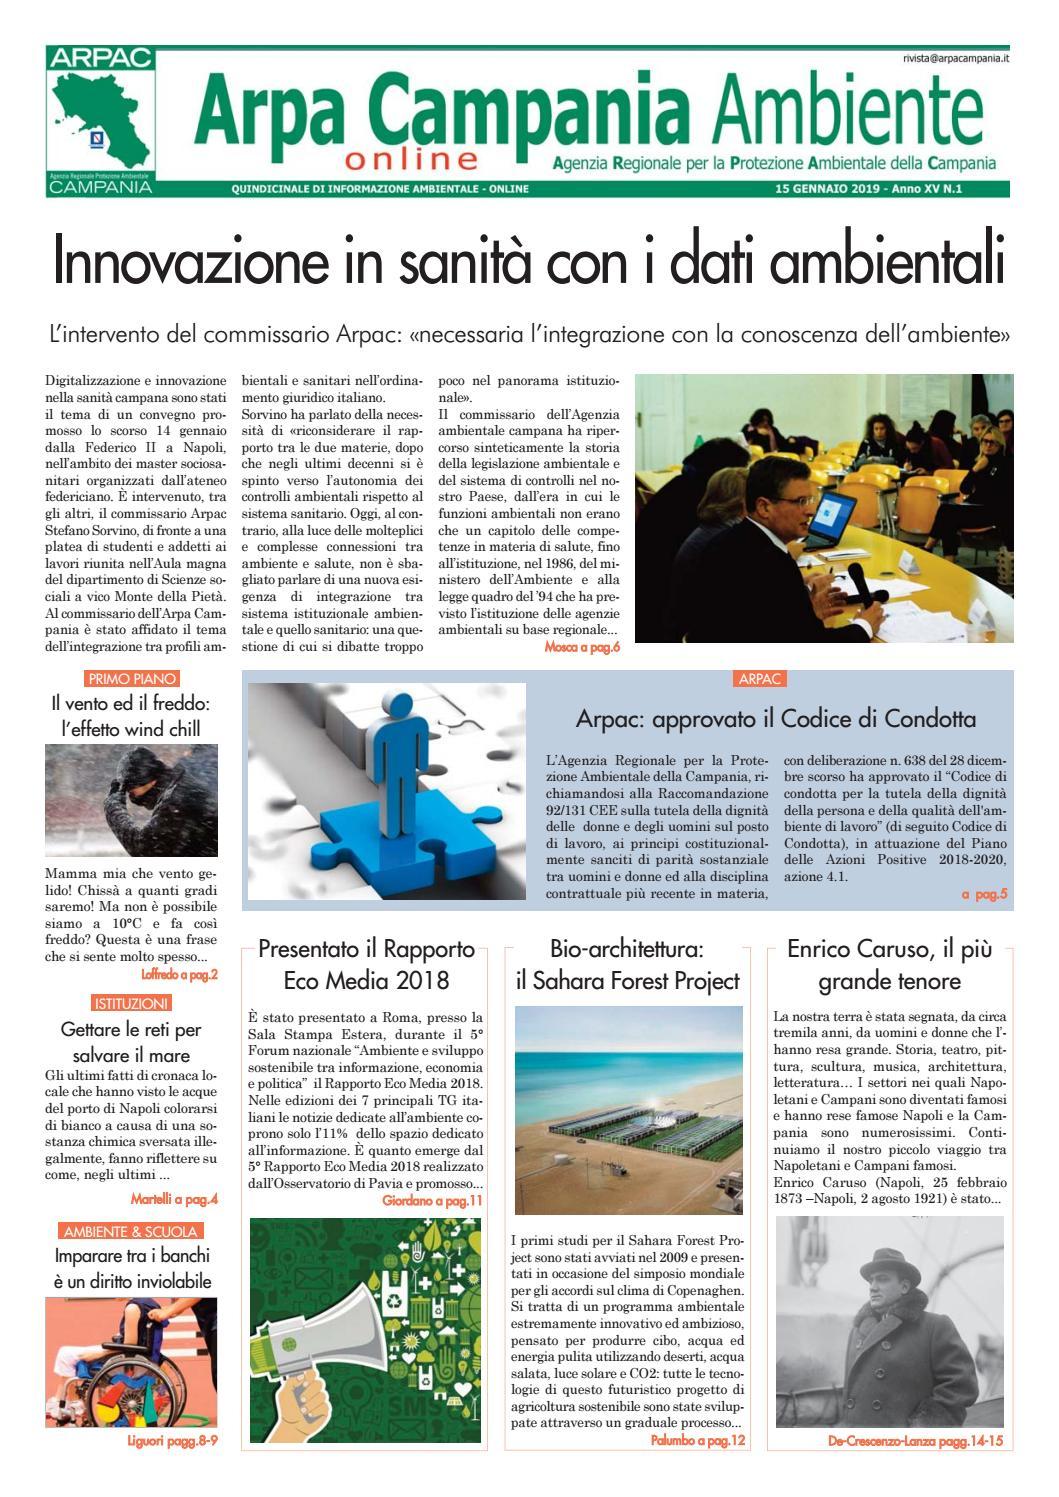 Arpa Campania Ambiente N 1 2019 By Arpa Campania Servizio